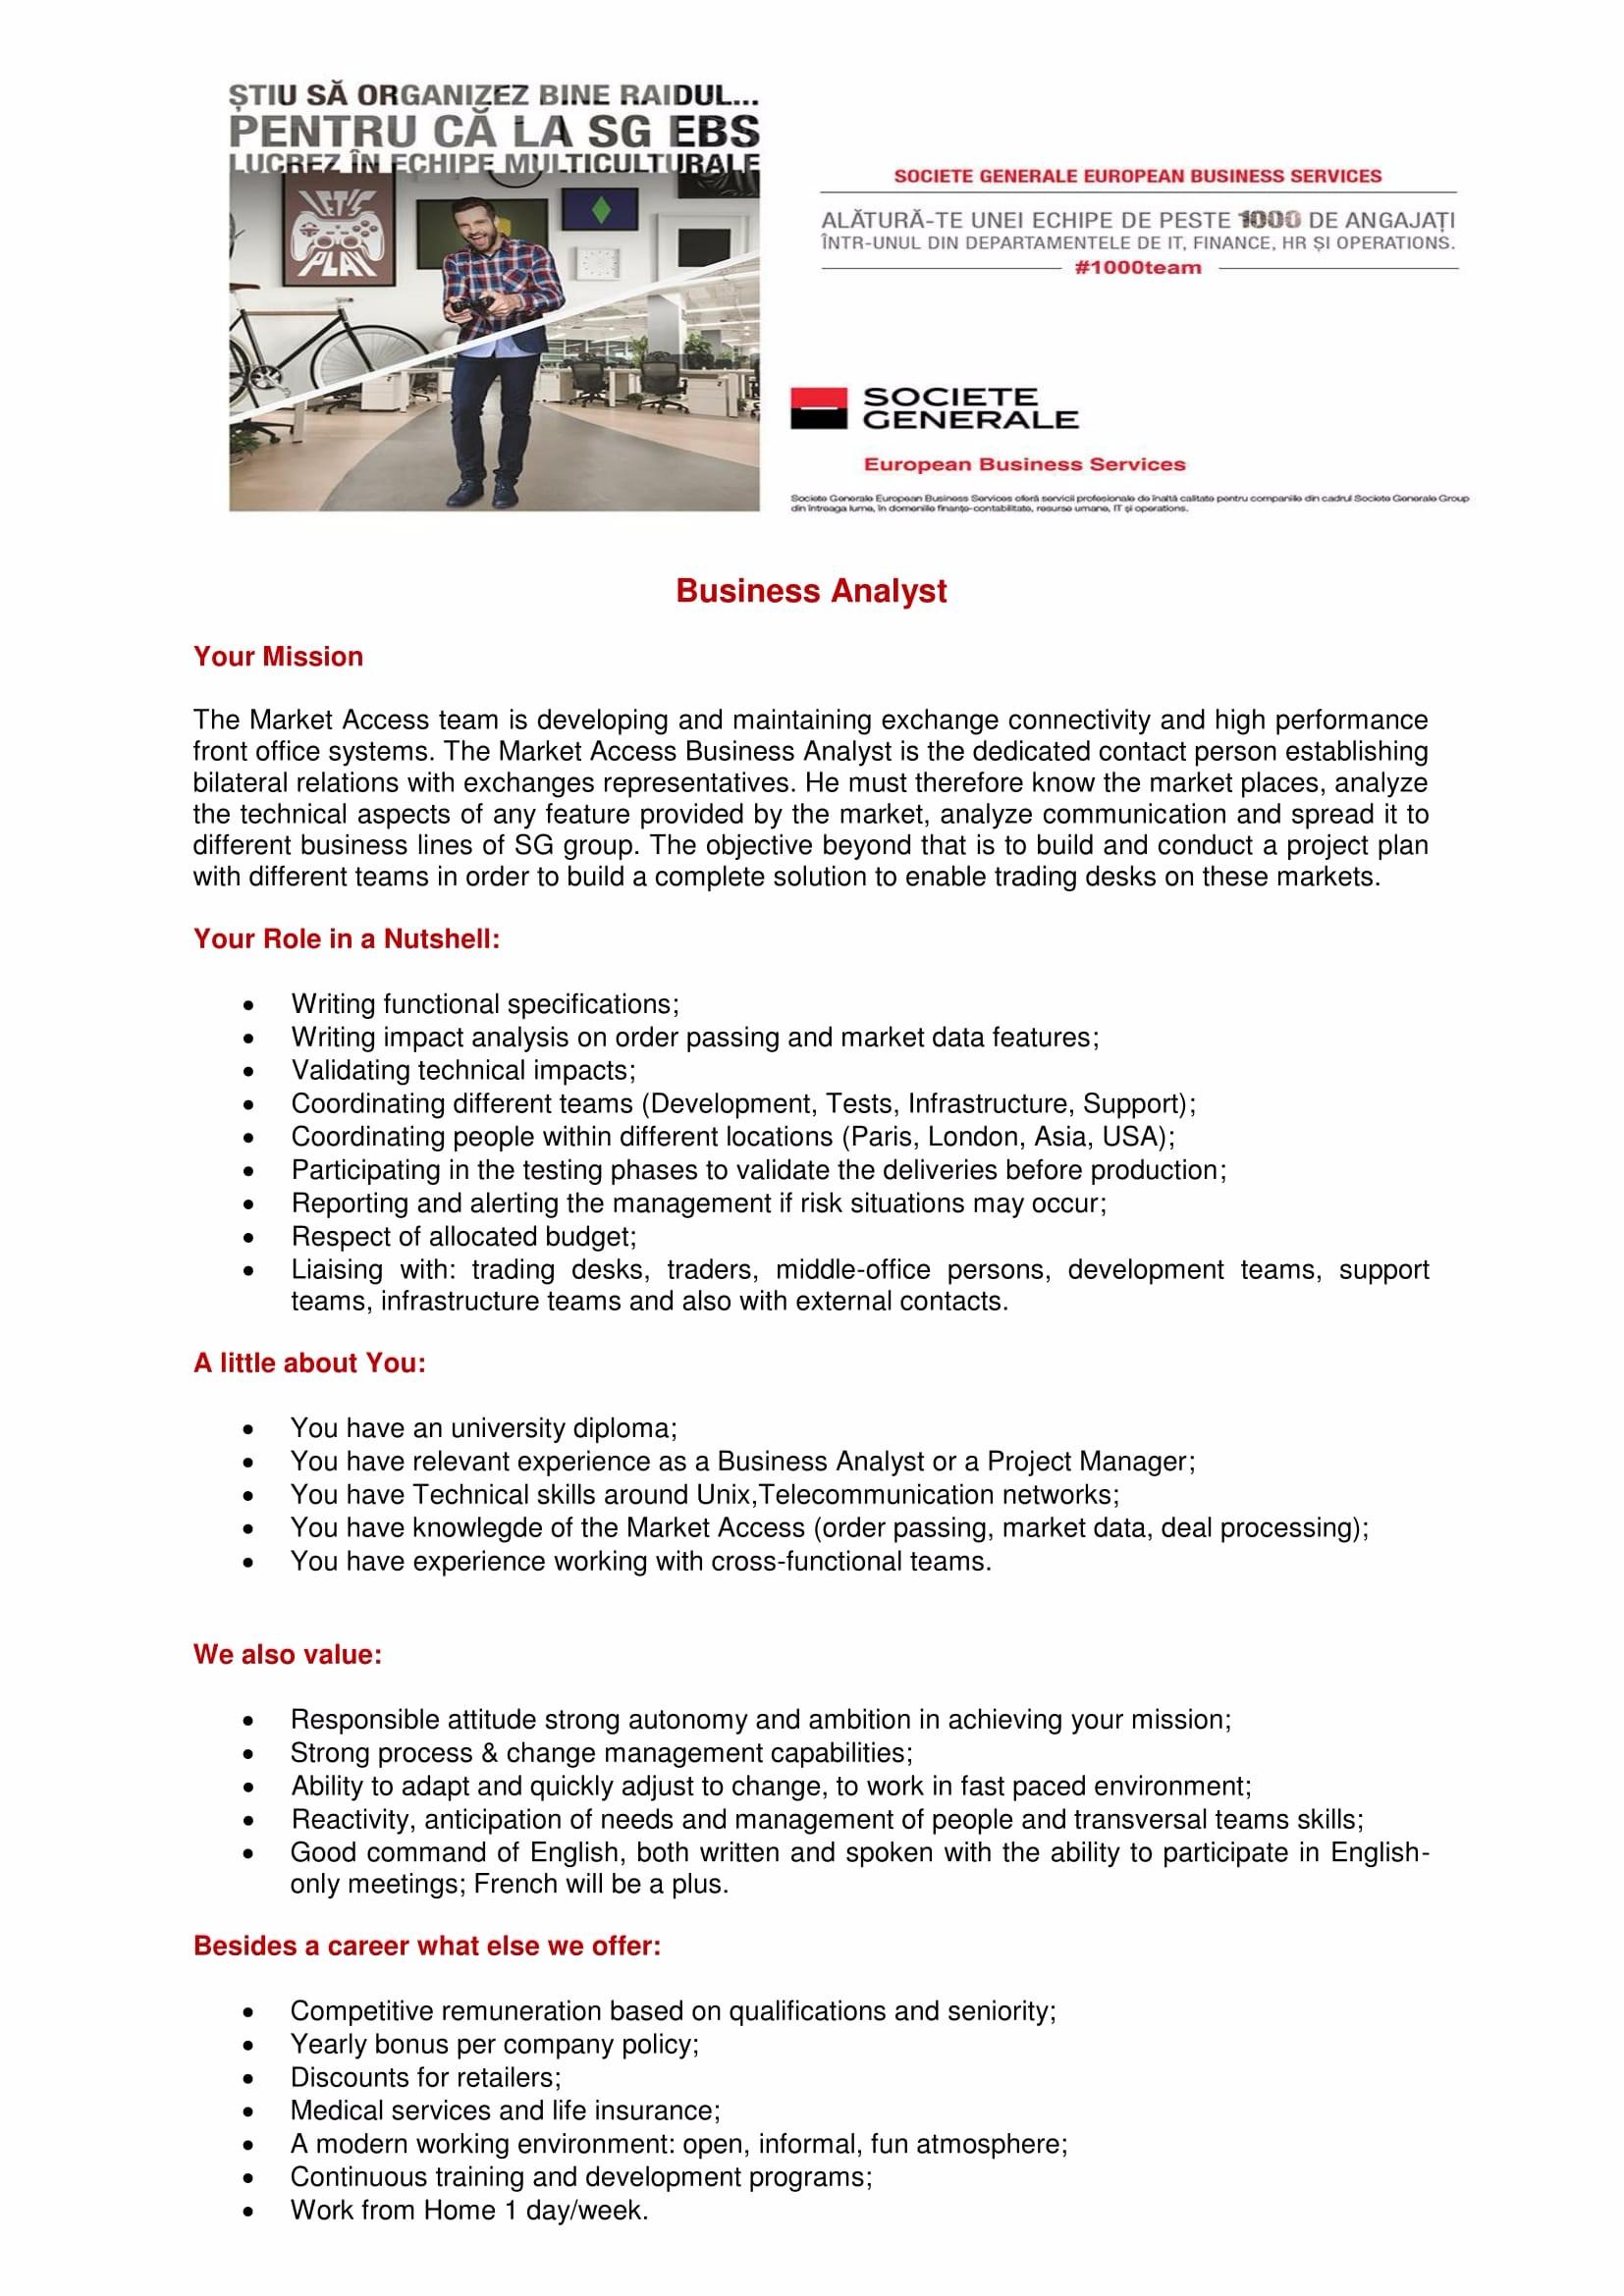 varianta sites de recur Business Analyst-1